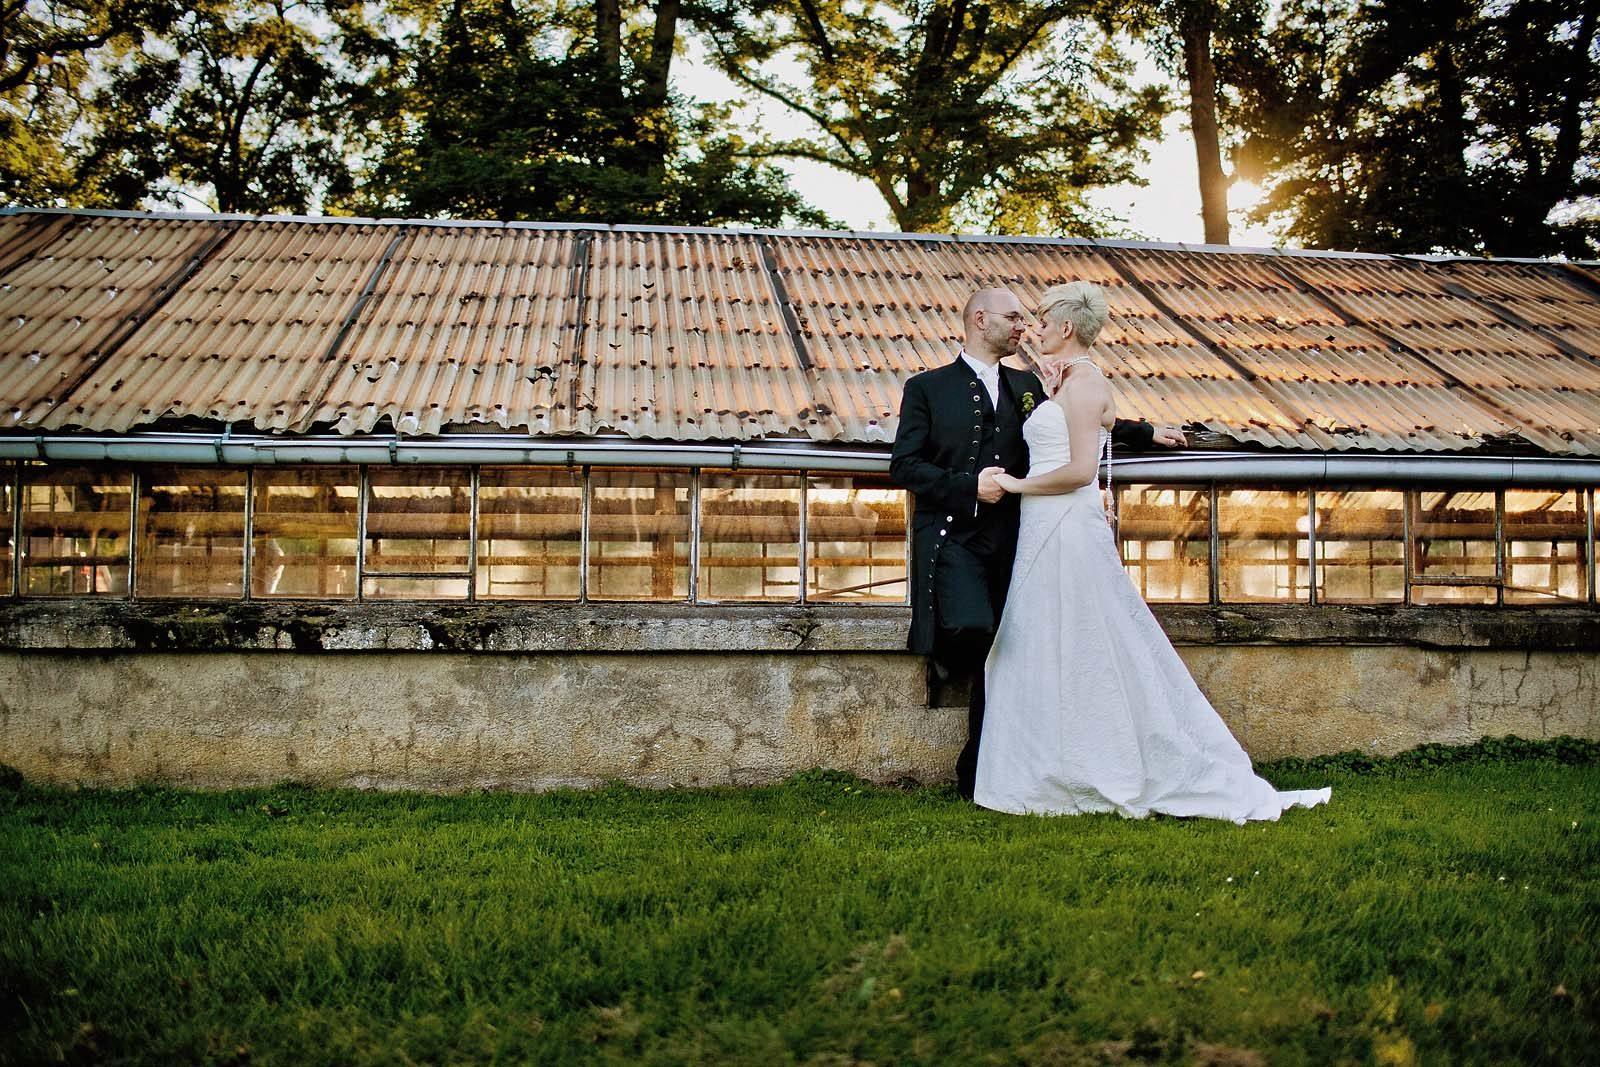 Hochzeitsfotograf Schloss Herzfelde